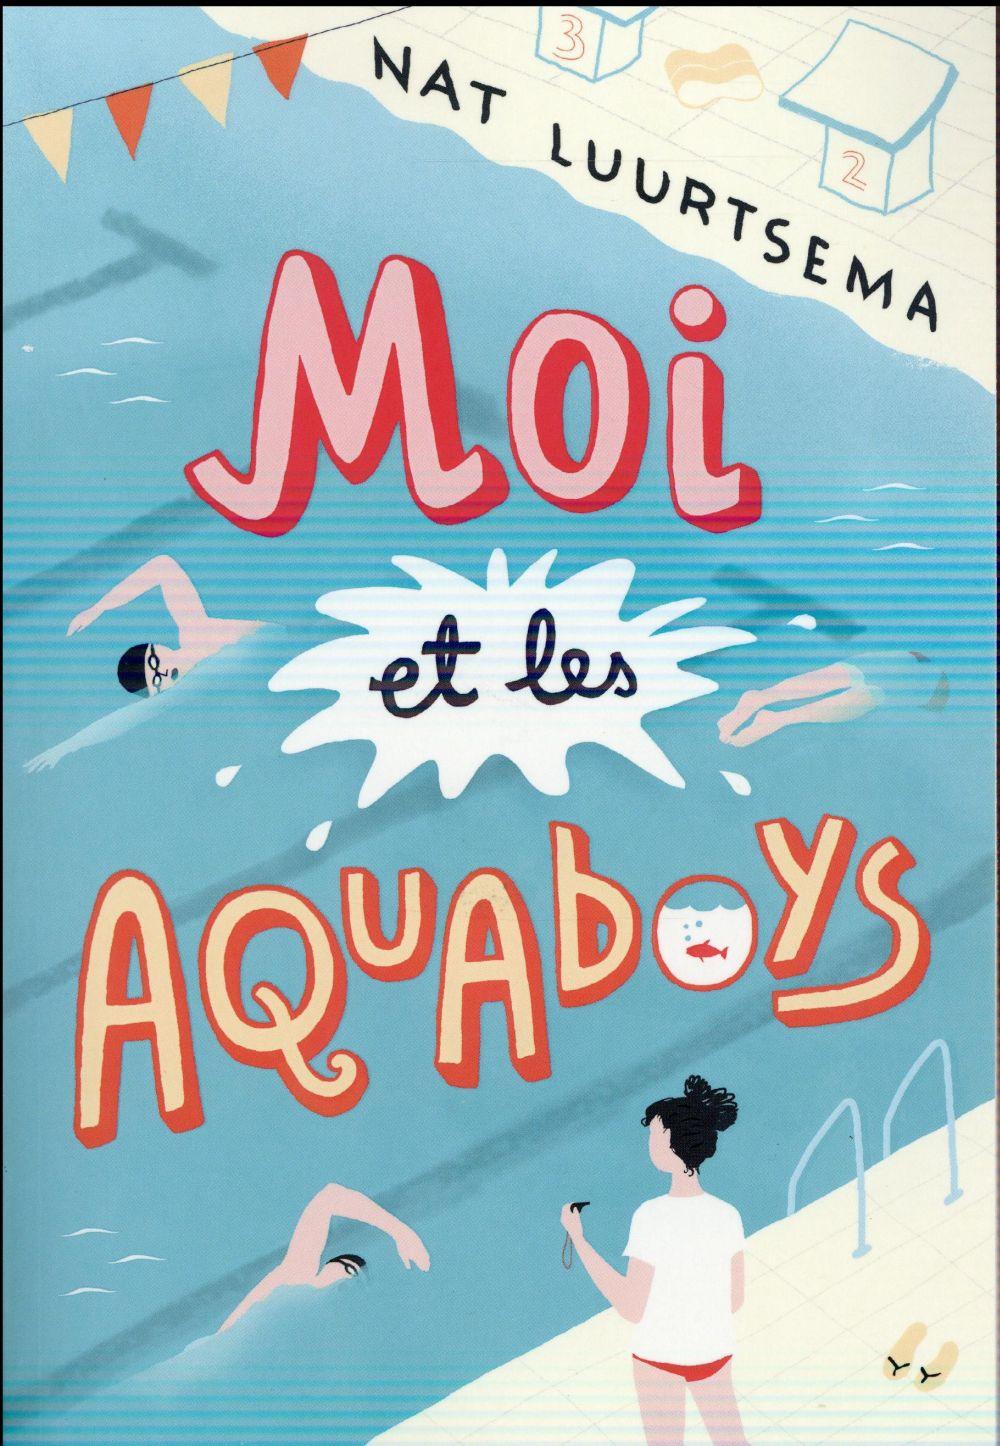 MOI ET LES AQUABOYS Luurtsema Nat Gallimard-Jeunesse